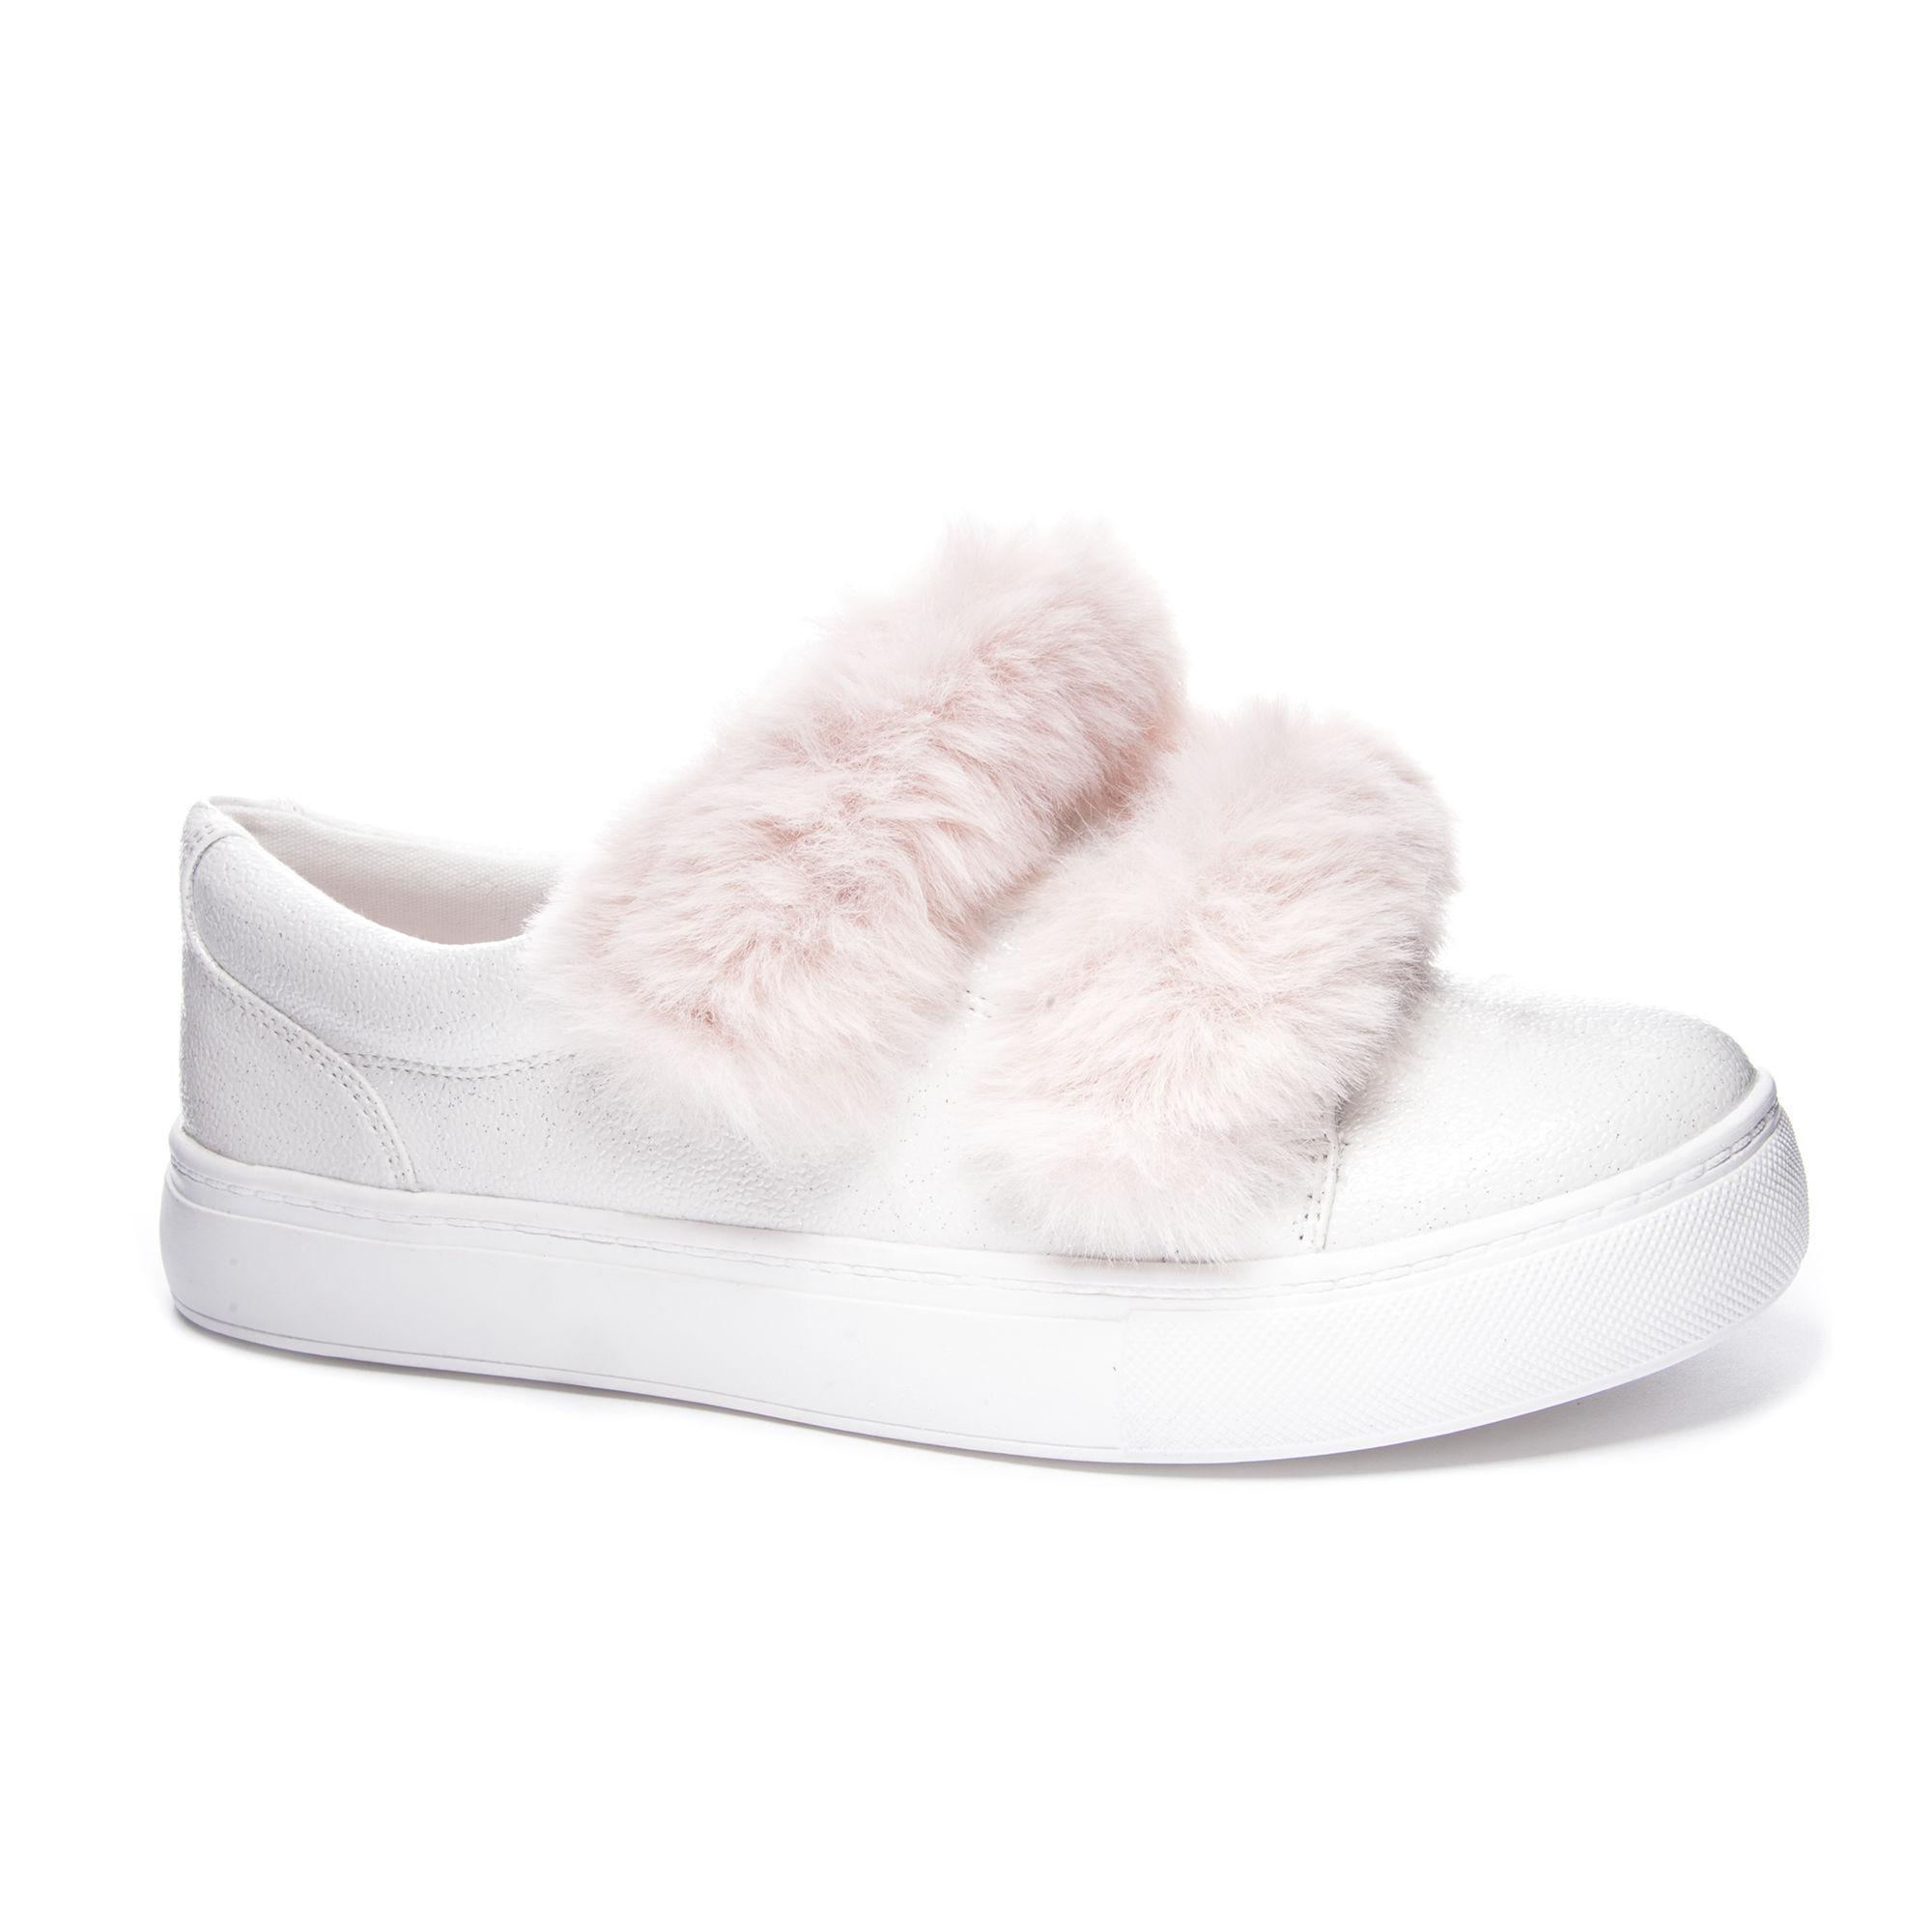 b809af124ed576 Lyst - Dirty Laundry Jordan Sneaker in White